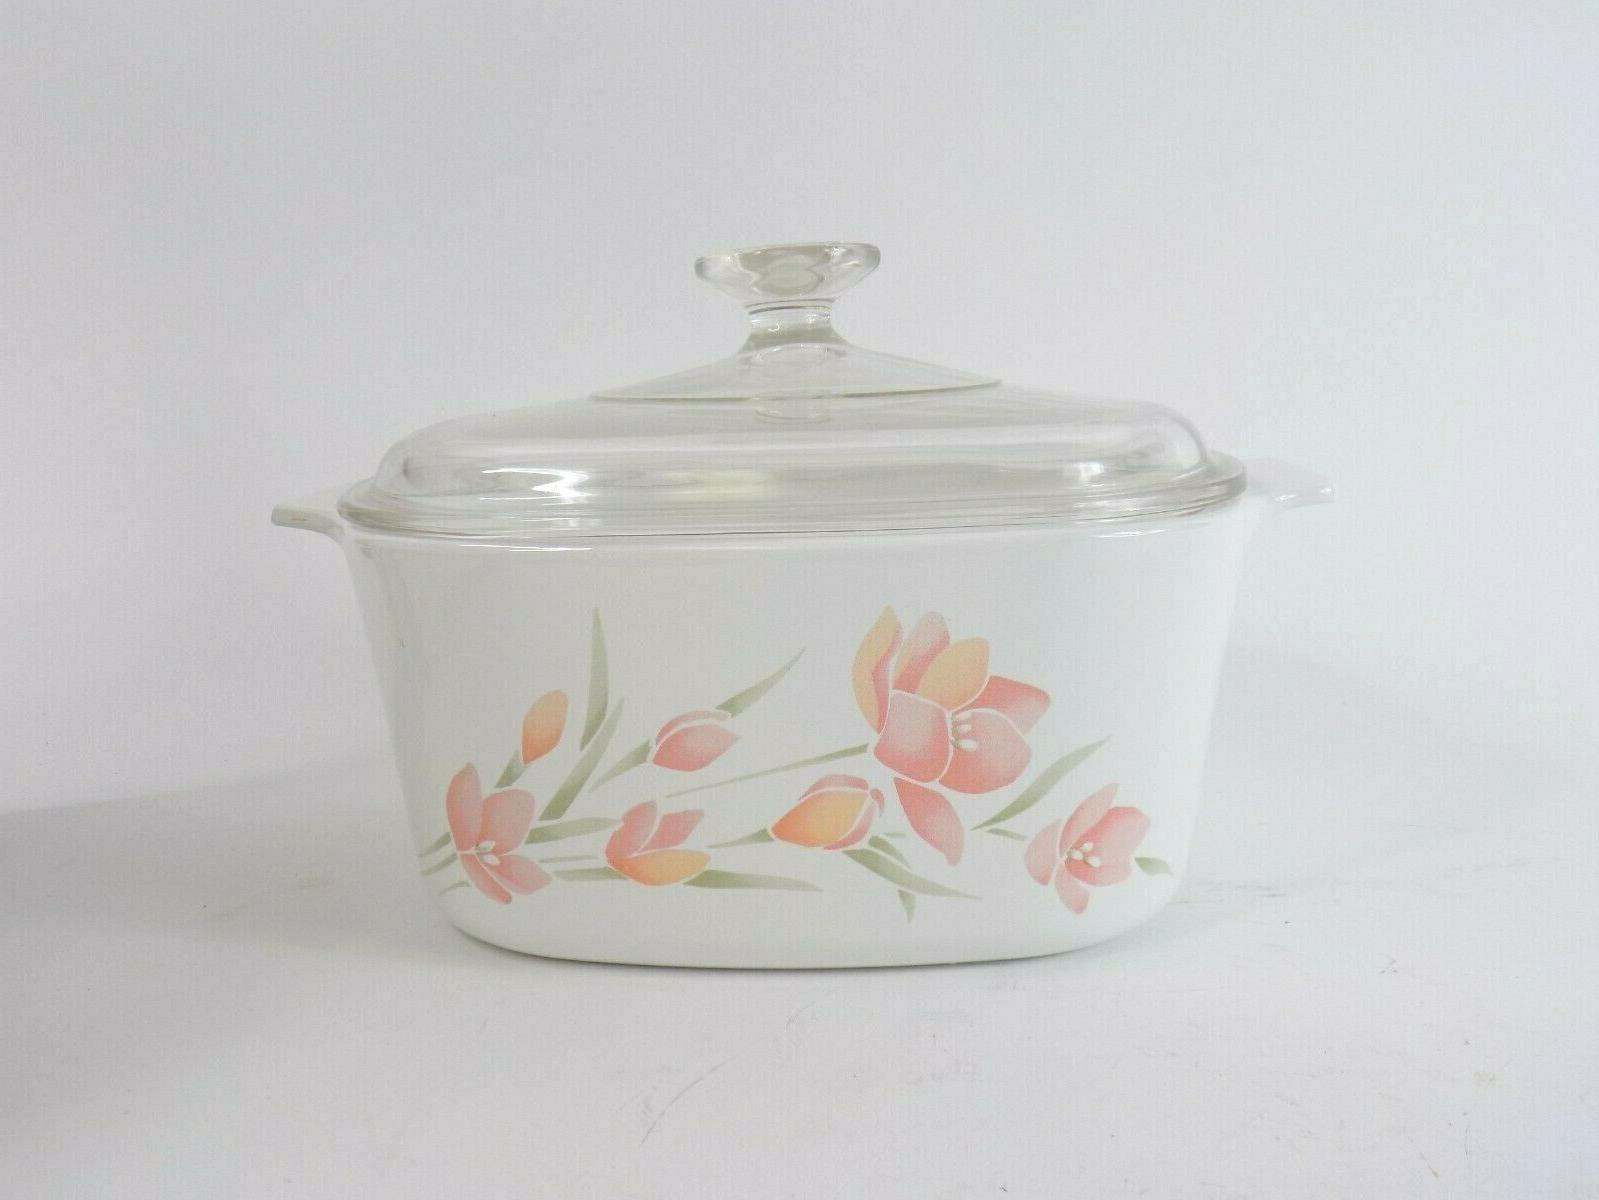 Vintage Corningware 3-qt Casserole Peach